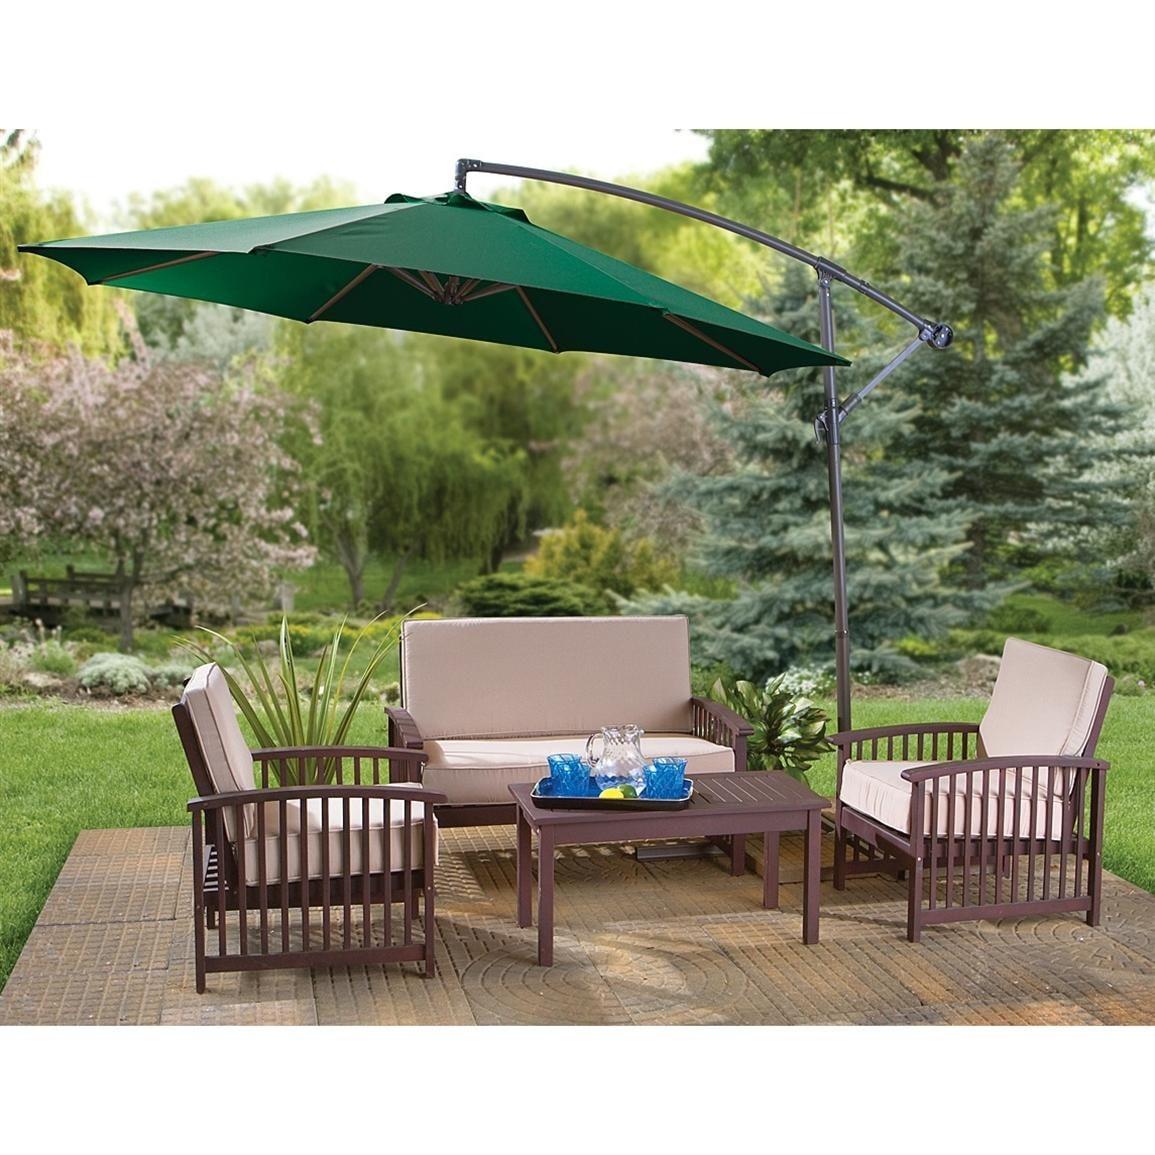 Belleze Patio Umbrella 10u0027 Cantilever Tilt UV Resistant Water Repellant W/  Crank Outdoor, Green   Free Shipping Today   Overstock.com   22363766